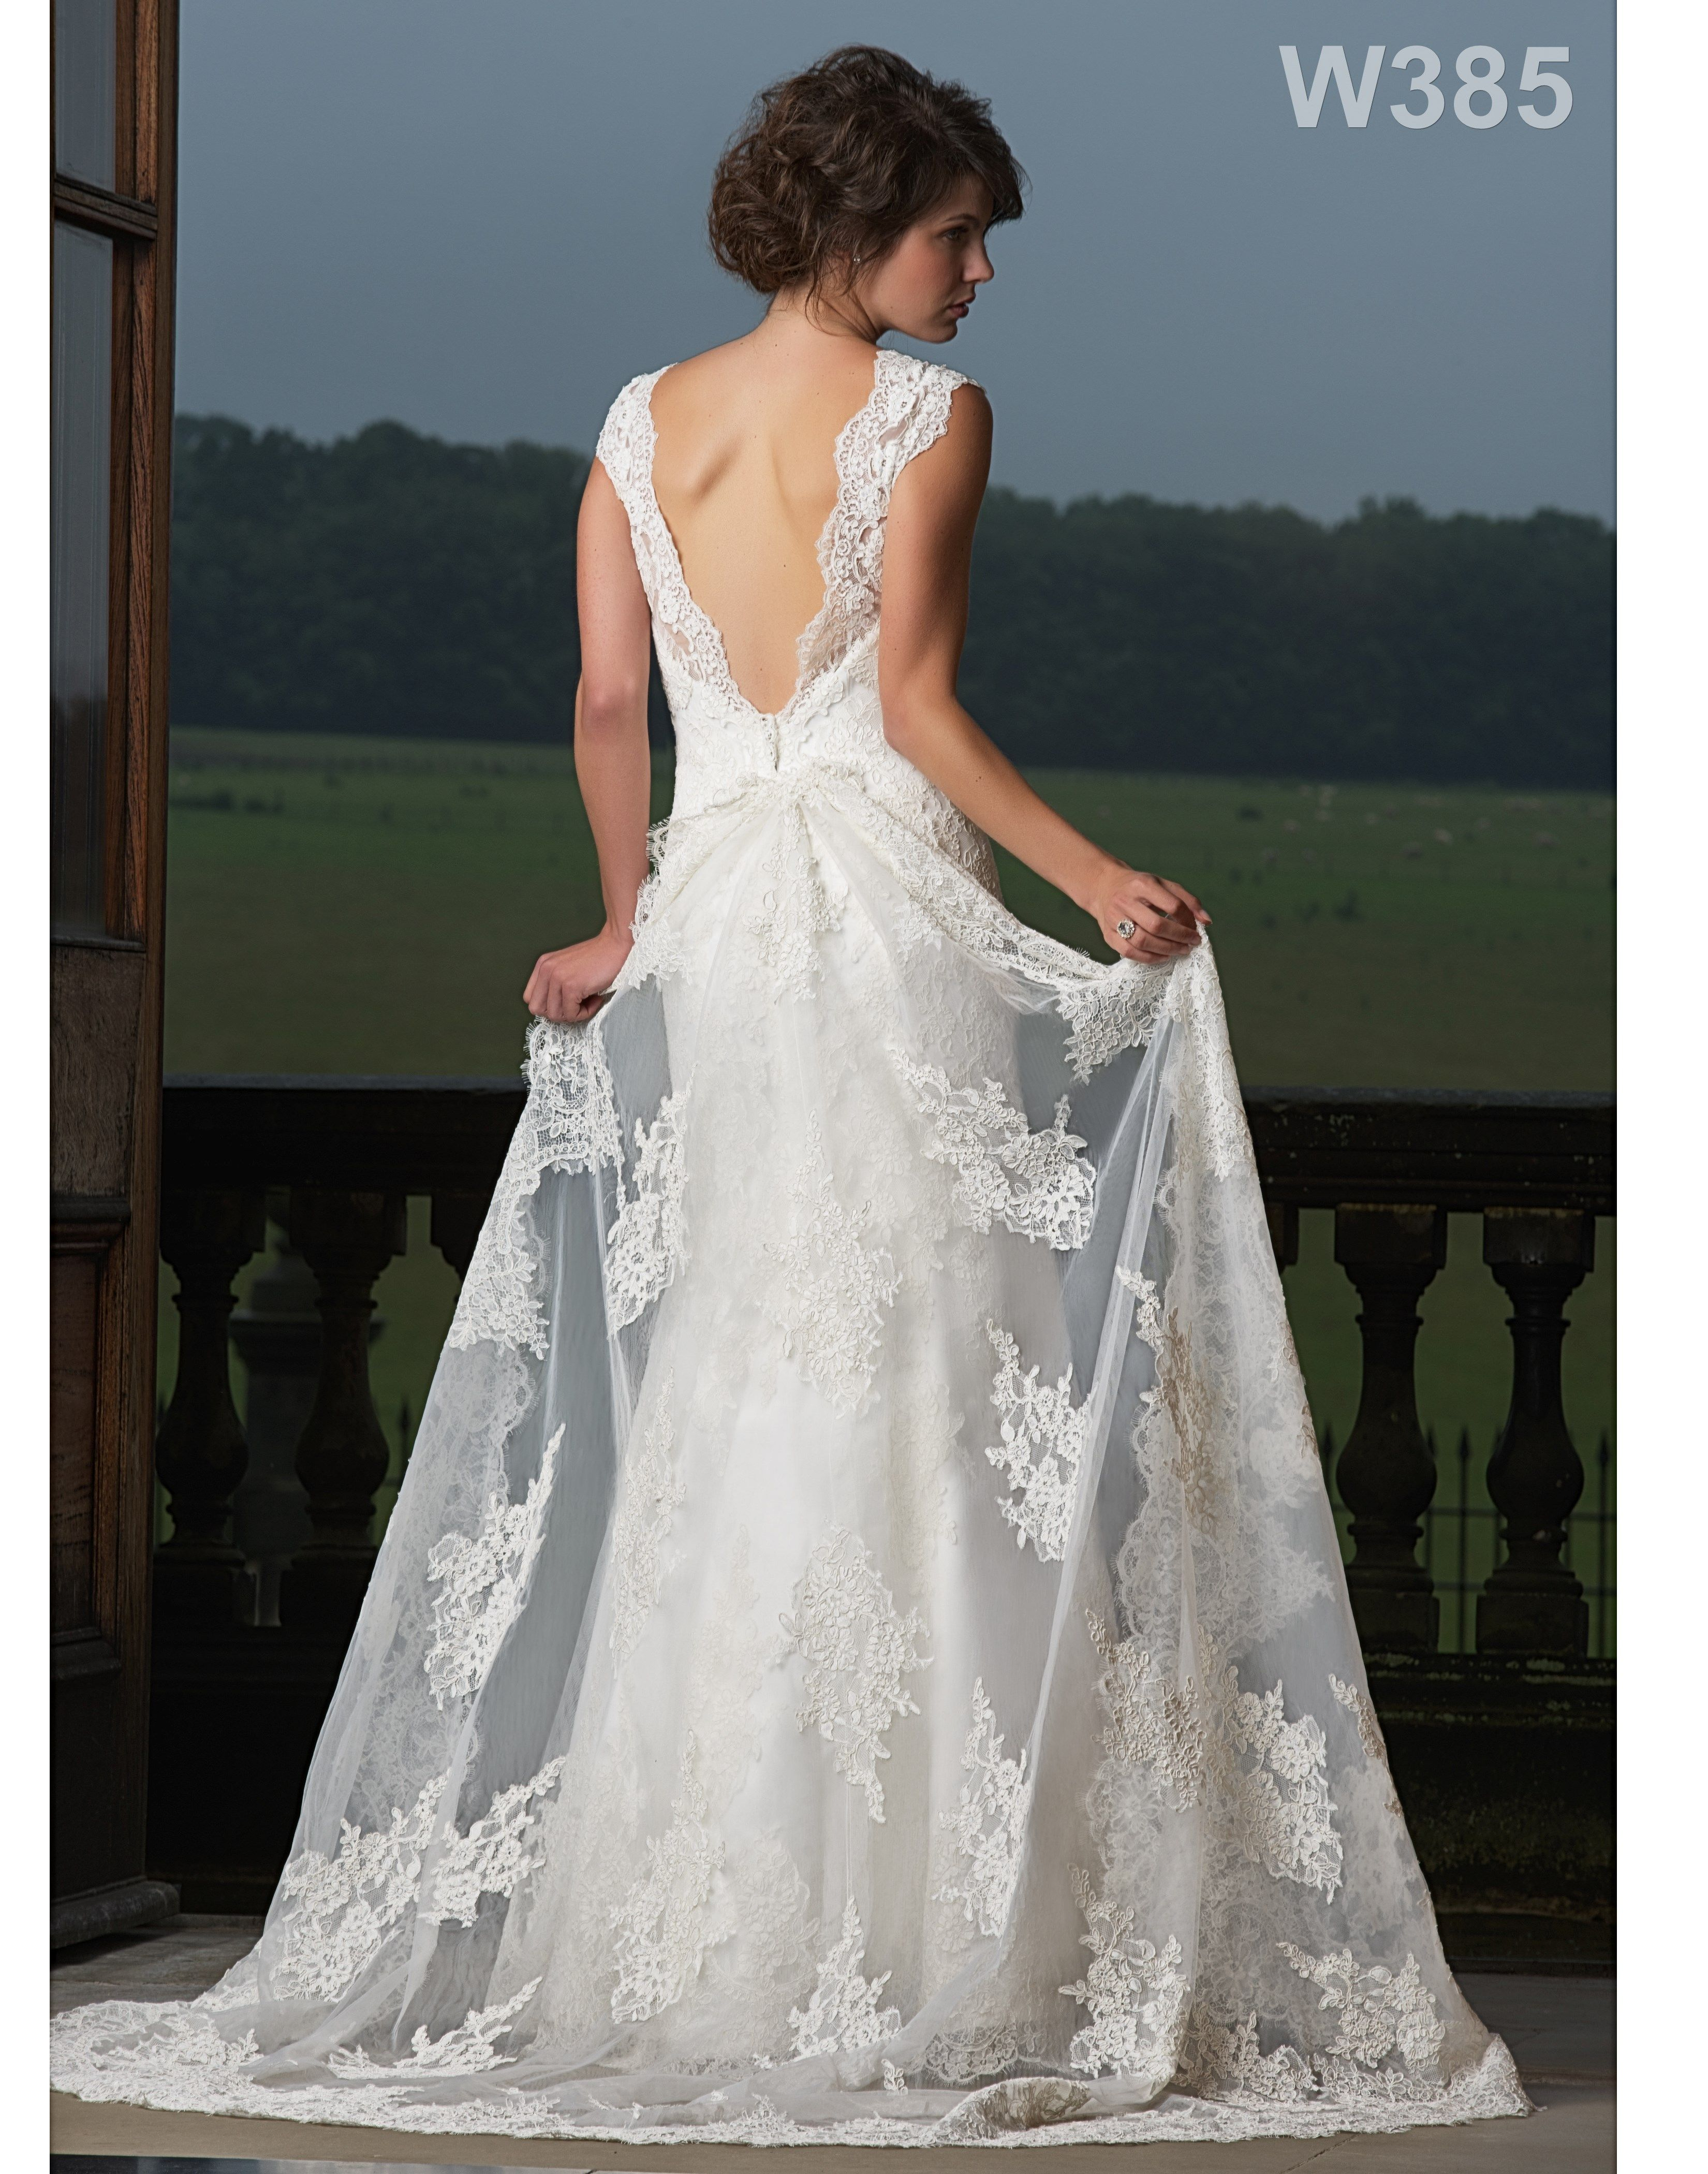 Style W385 #AlexiaDesigns #LaceBridalDress #WeddingDress www.alexiadesigns.com Love lace - always so elegant.